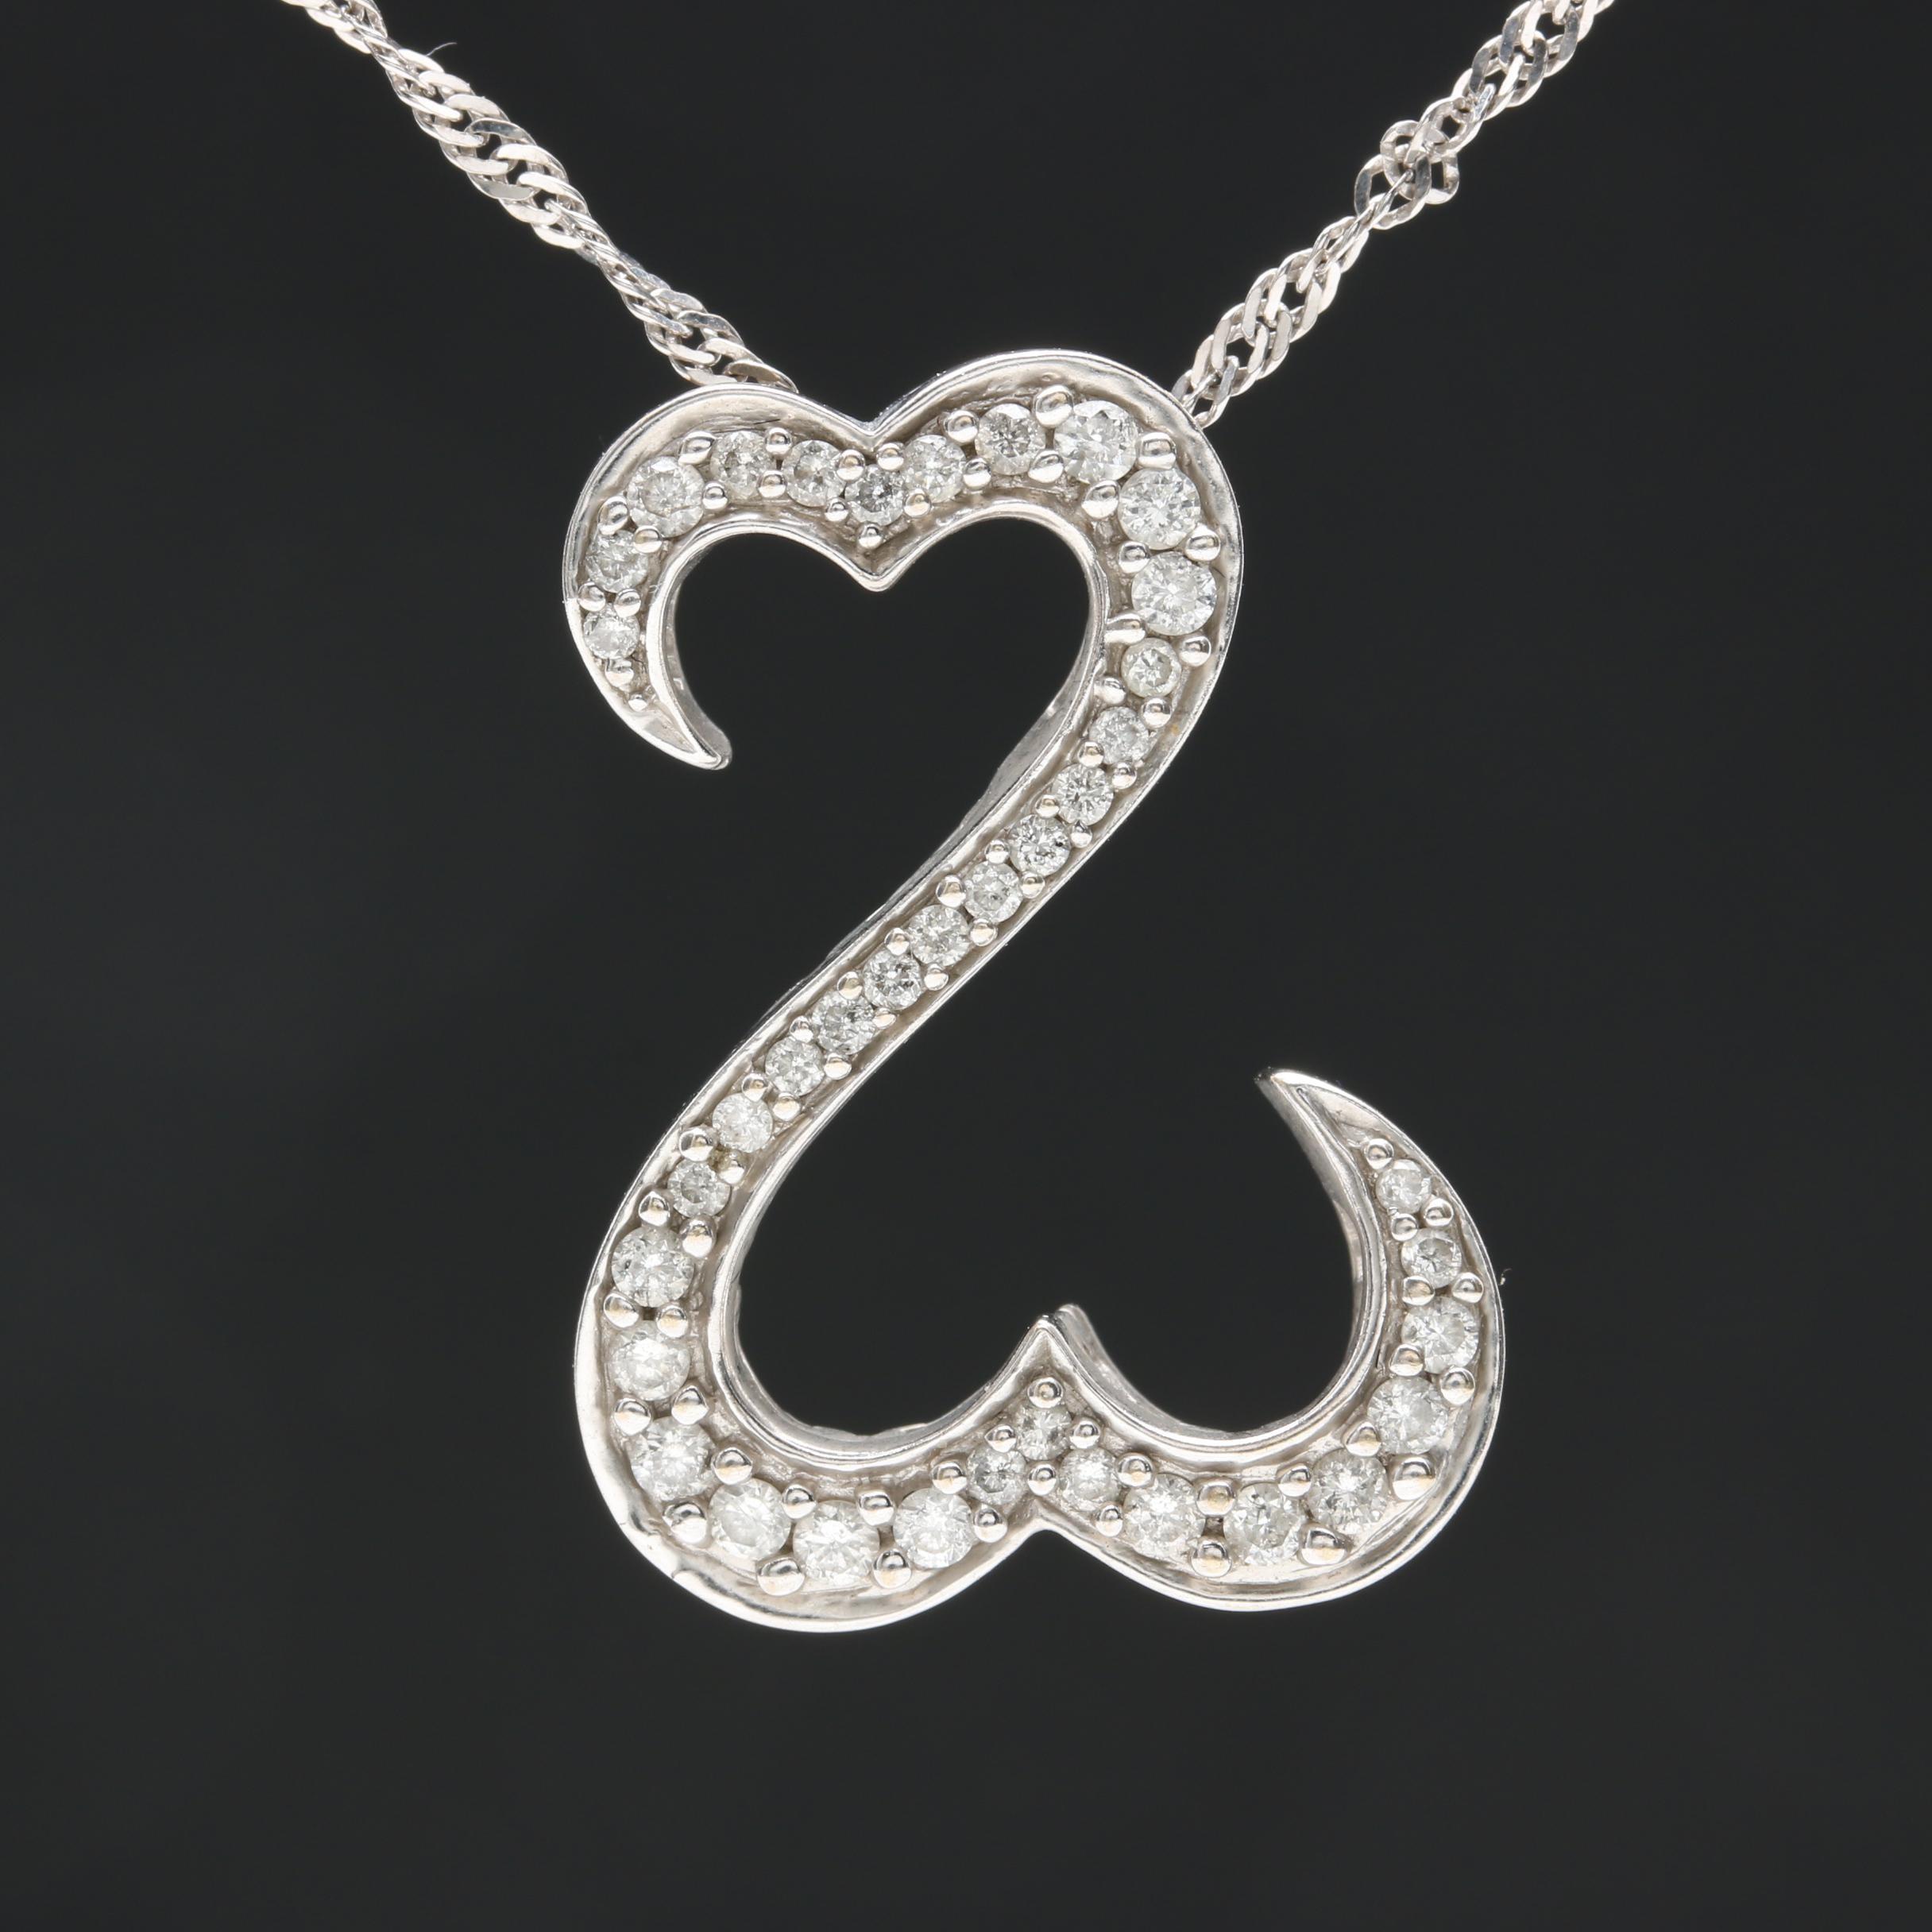 Jane Seymour Open Heart Collection 14K White Gold Diamond Pendant Necklace